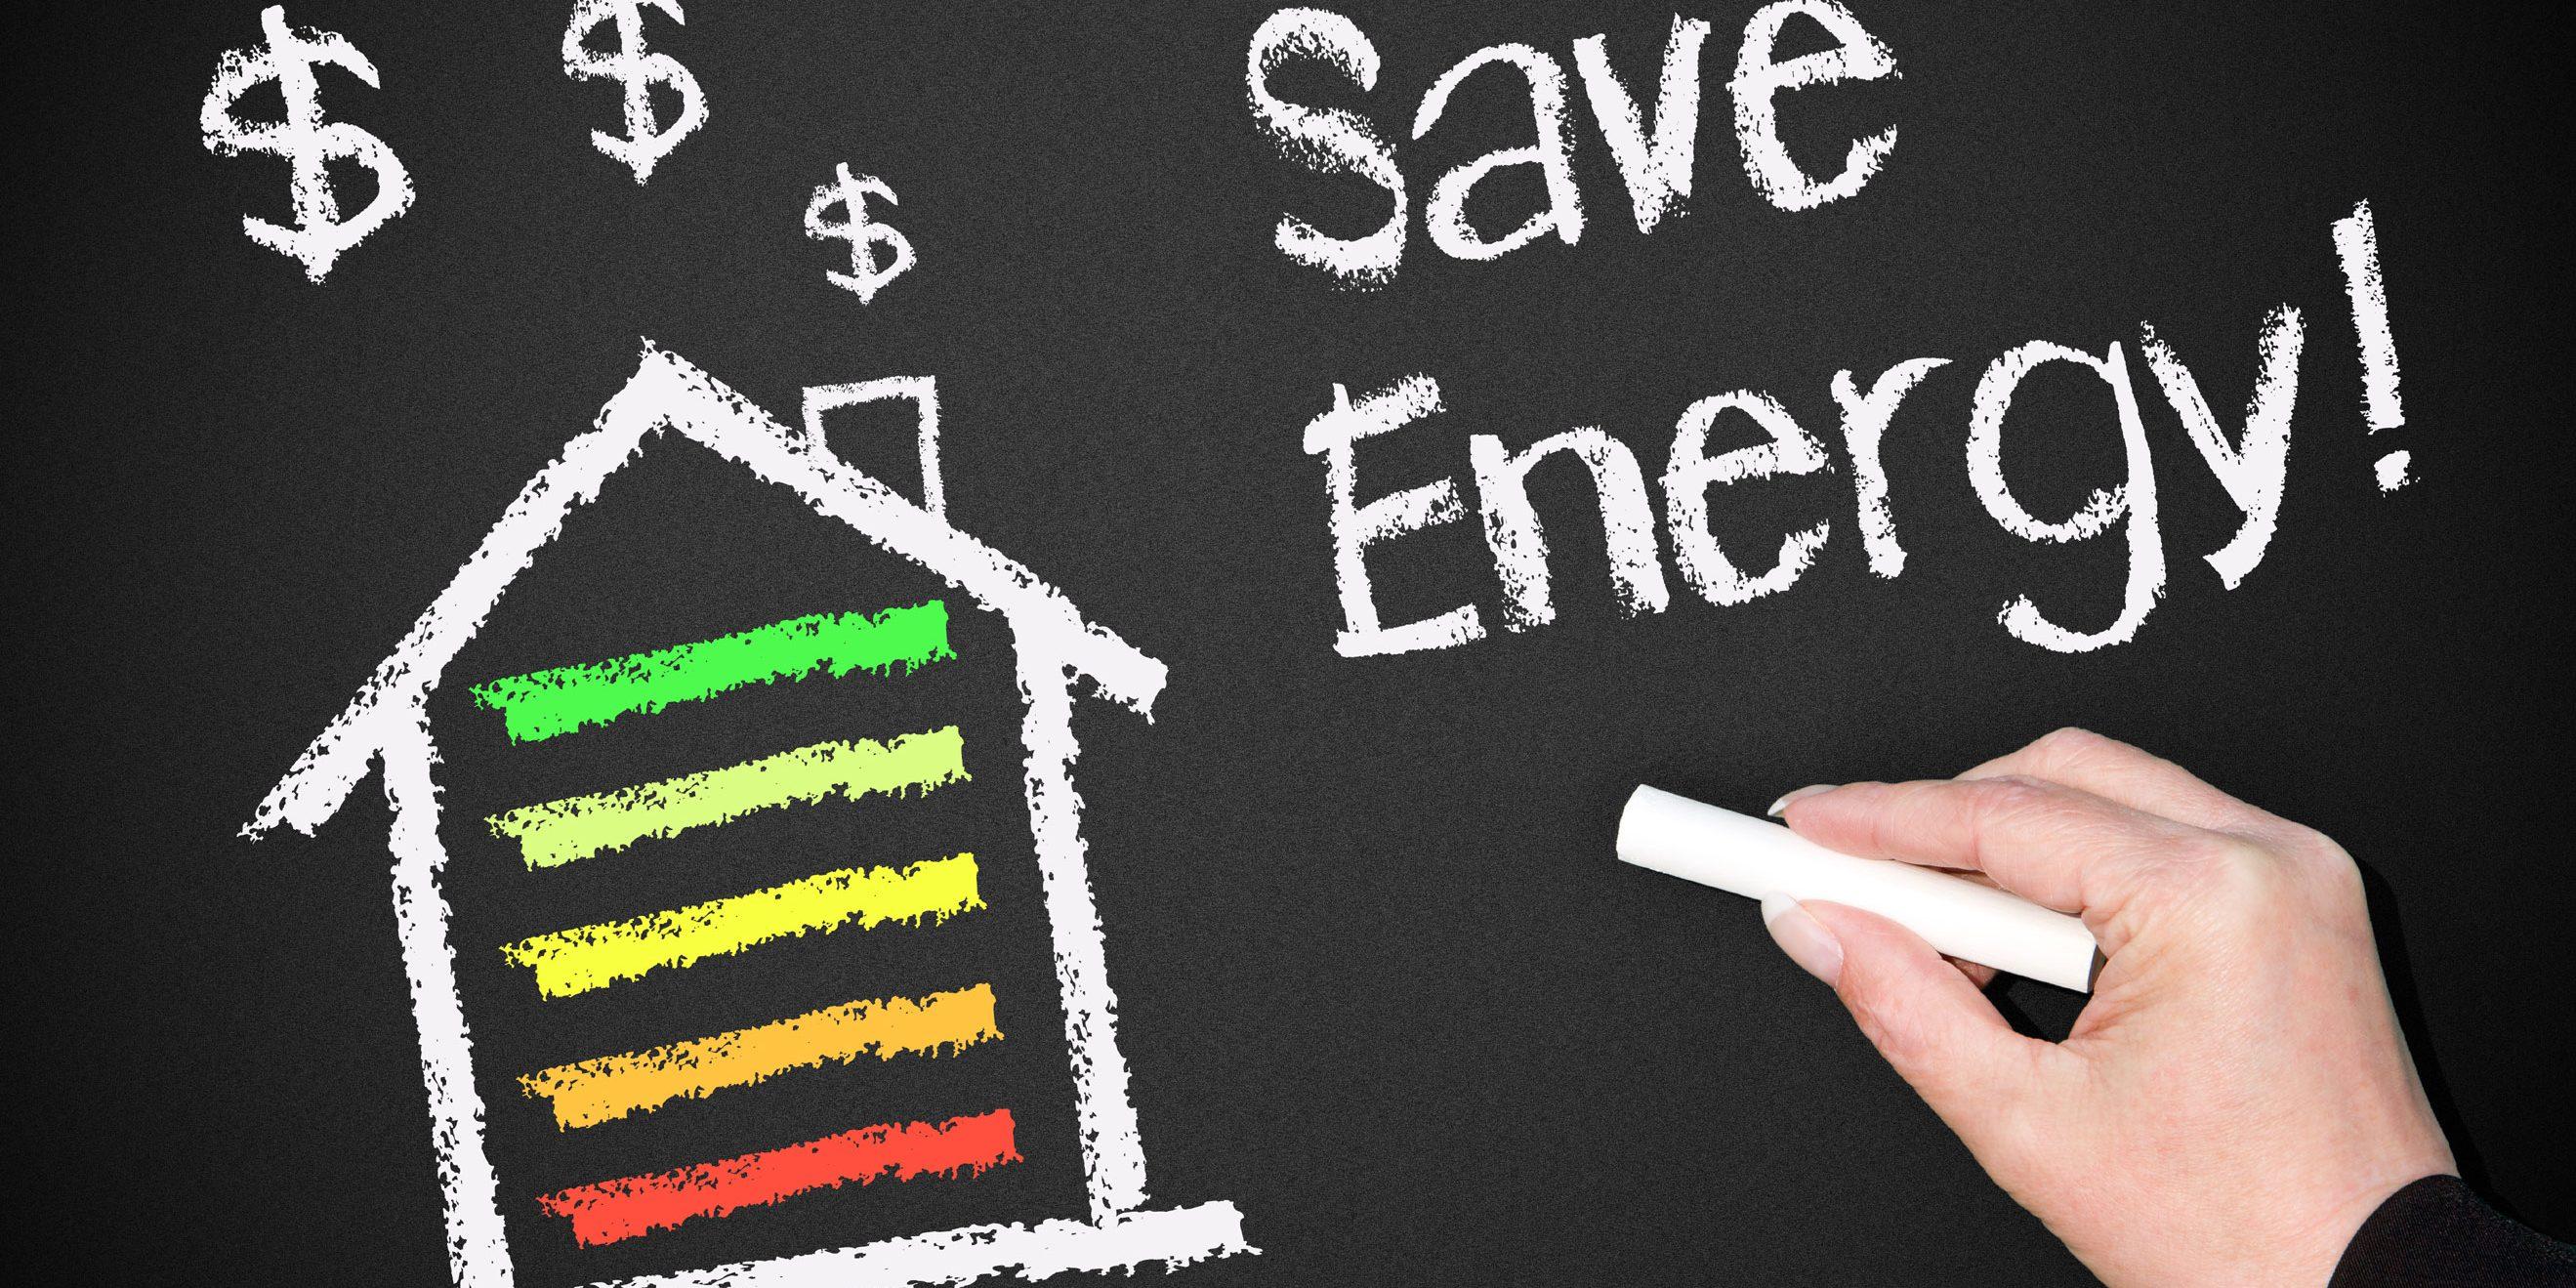 energiespartipps so sparen sie bares geld immobilien kreis heinsberg. Black Bedroom Furniture Sets. Home Design Ideas